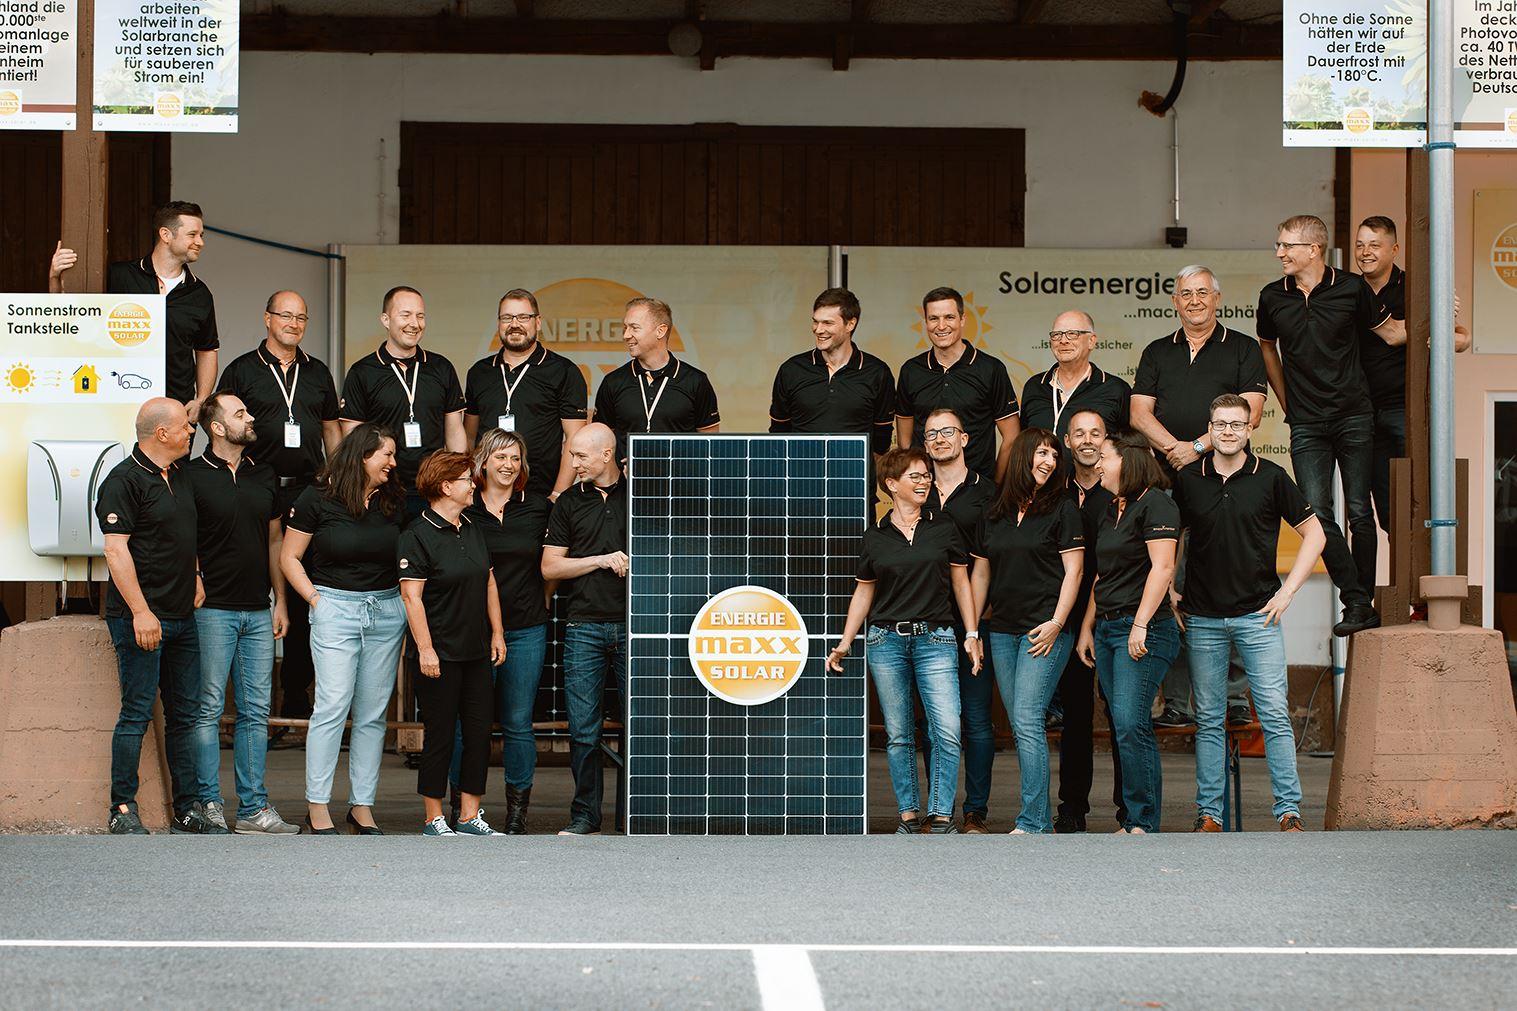 Teambild für den maxx solar starterblog